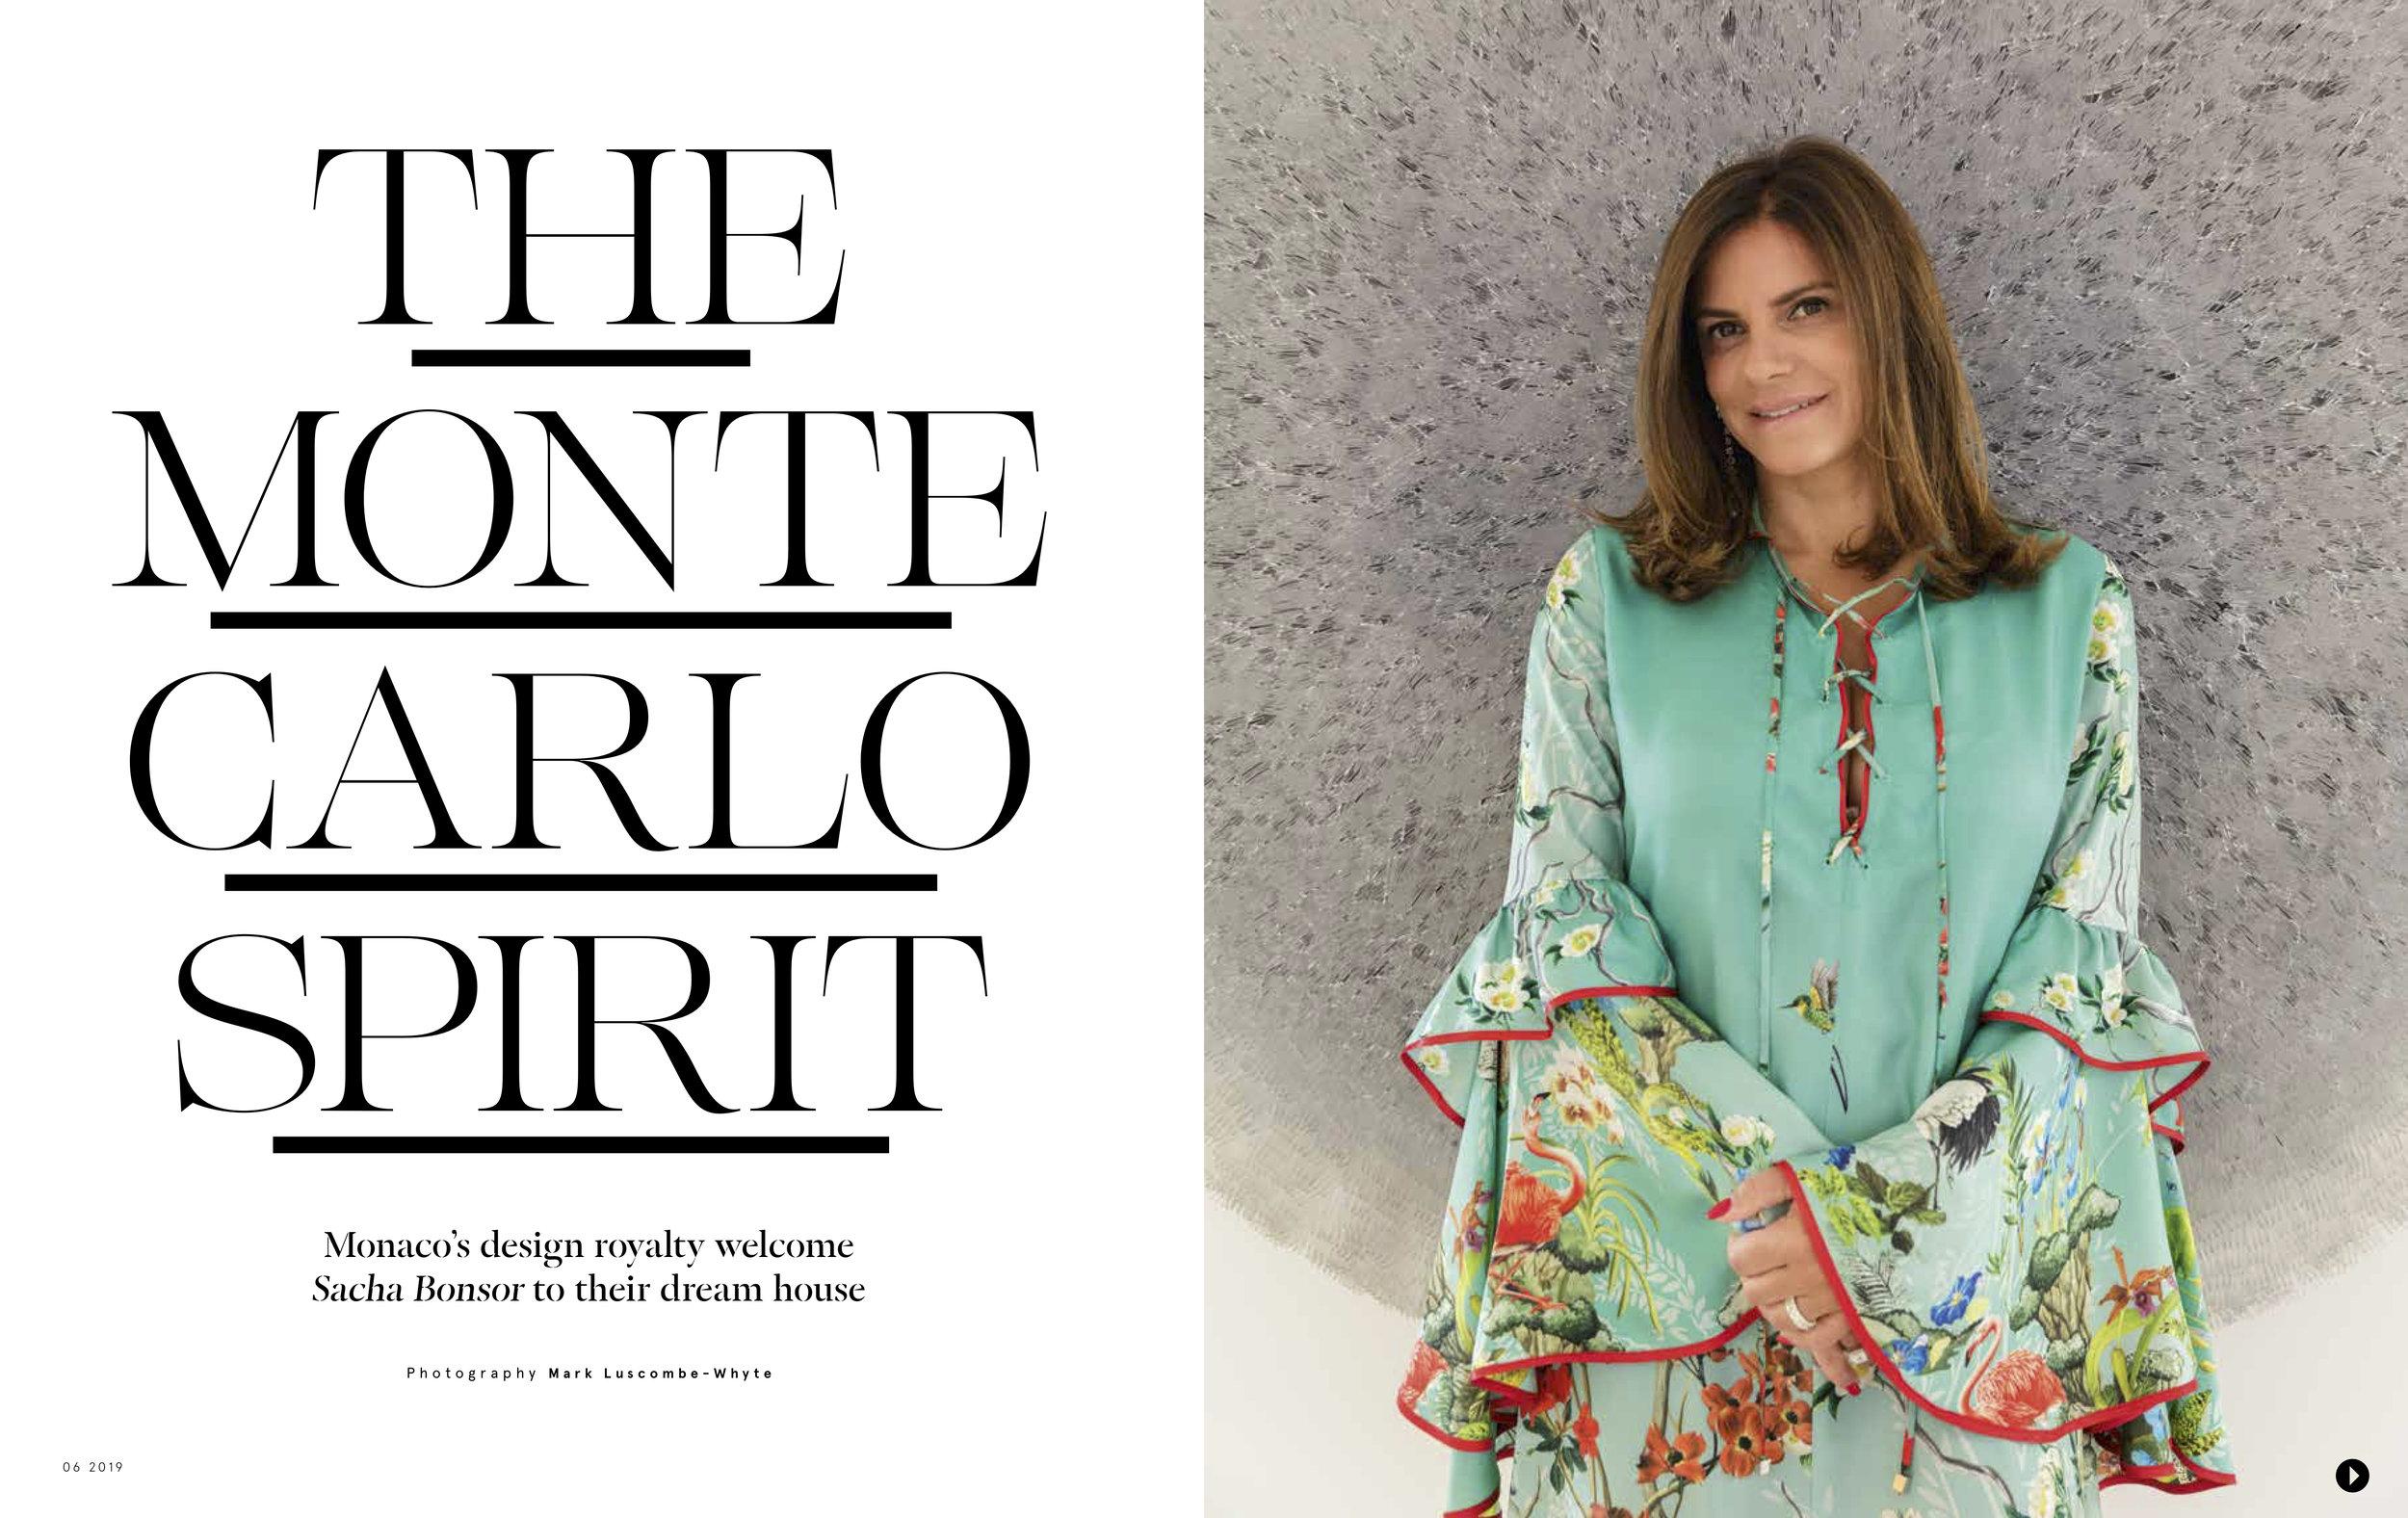 Boat International. Sabrina Monteleone-Oeino. Monaco.